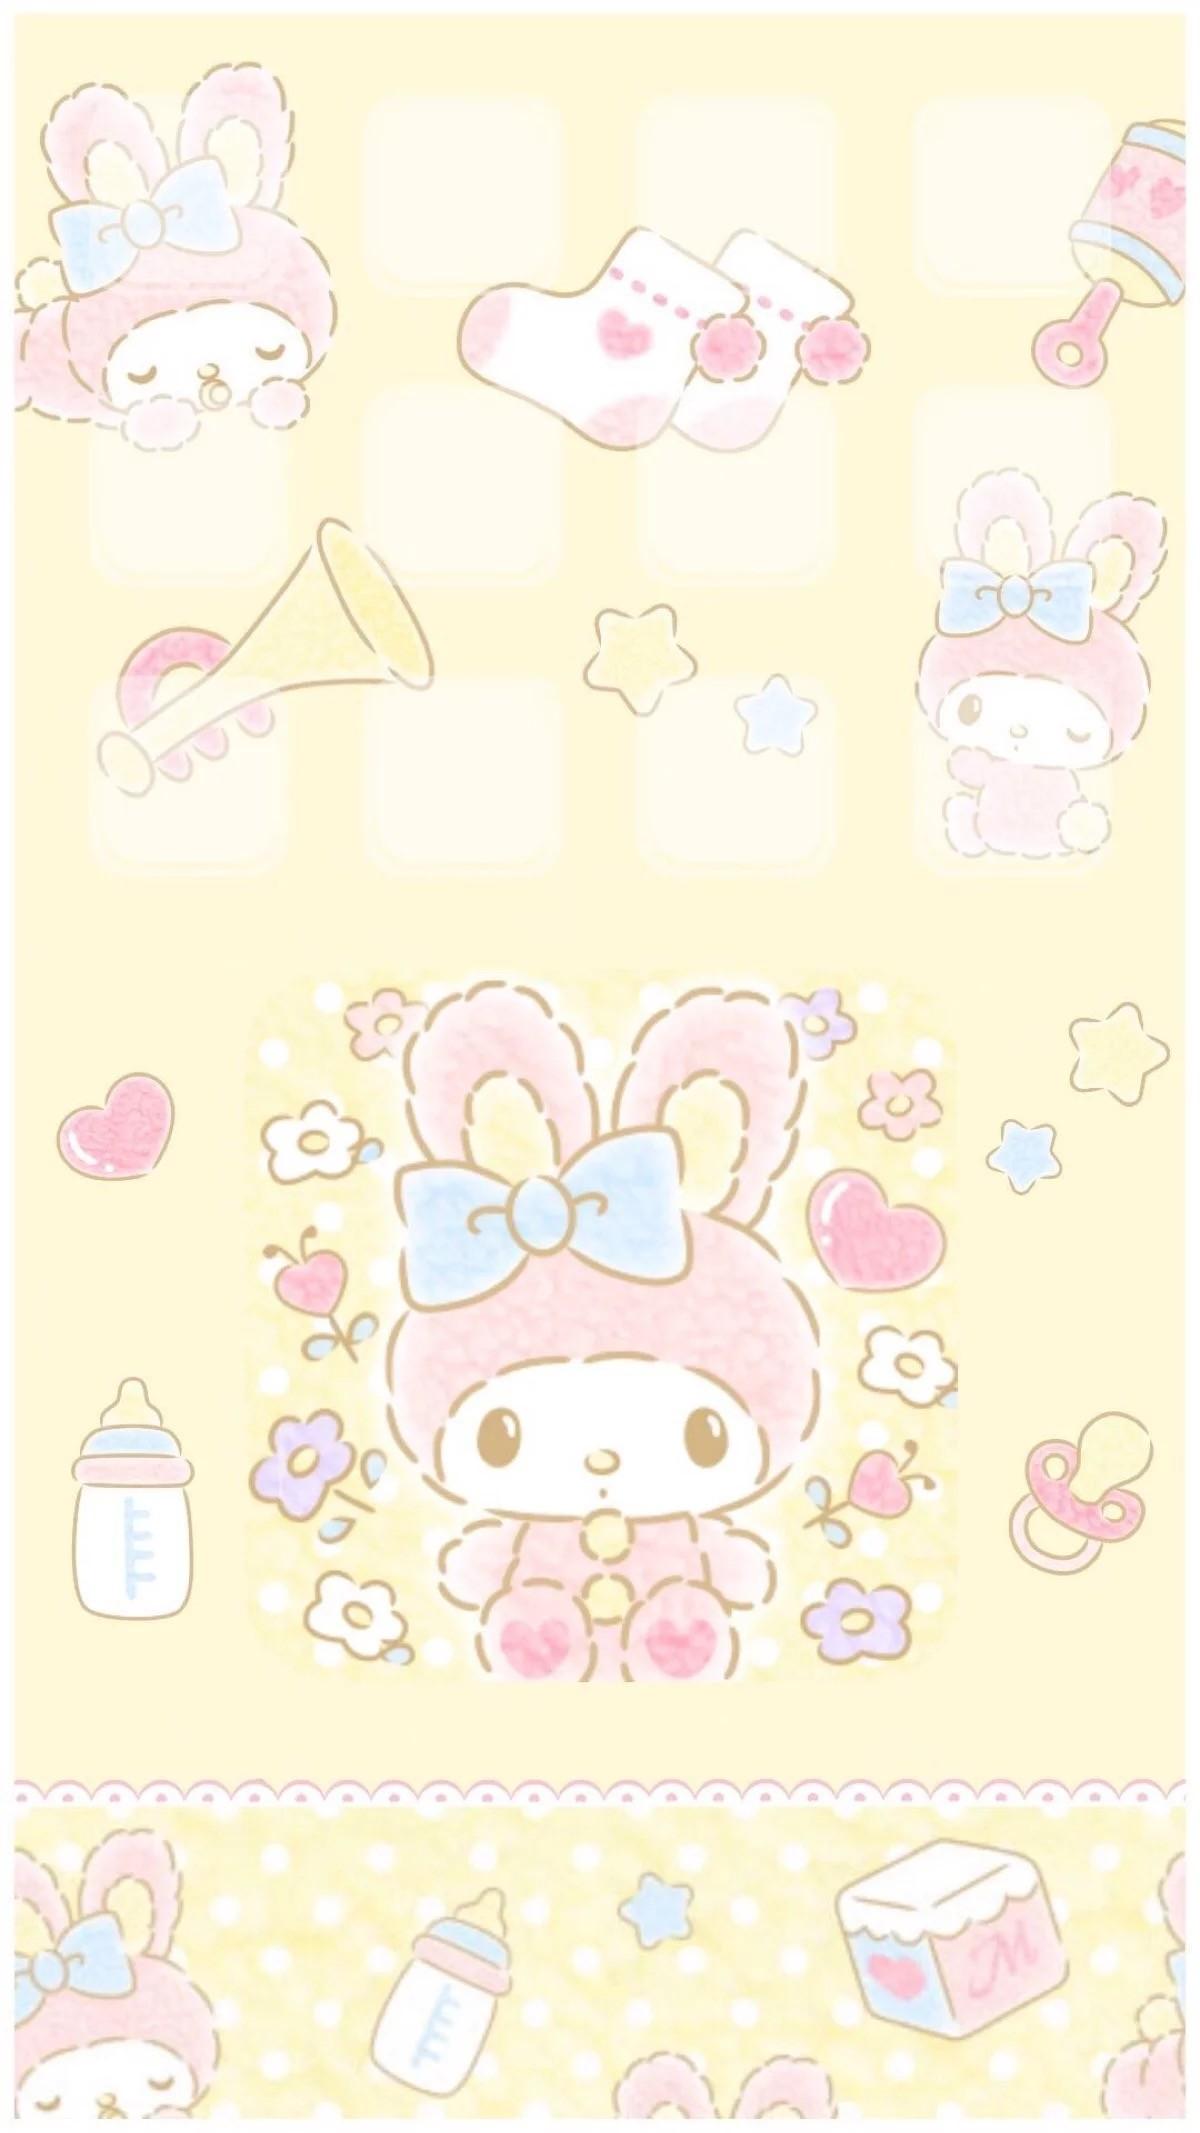 Cute Sanrio Wallpapers My Melody Wallpaper 183 ①